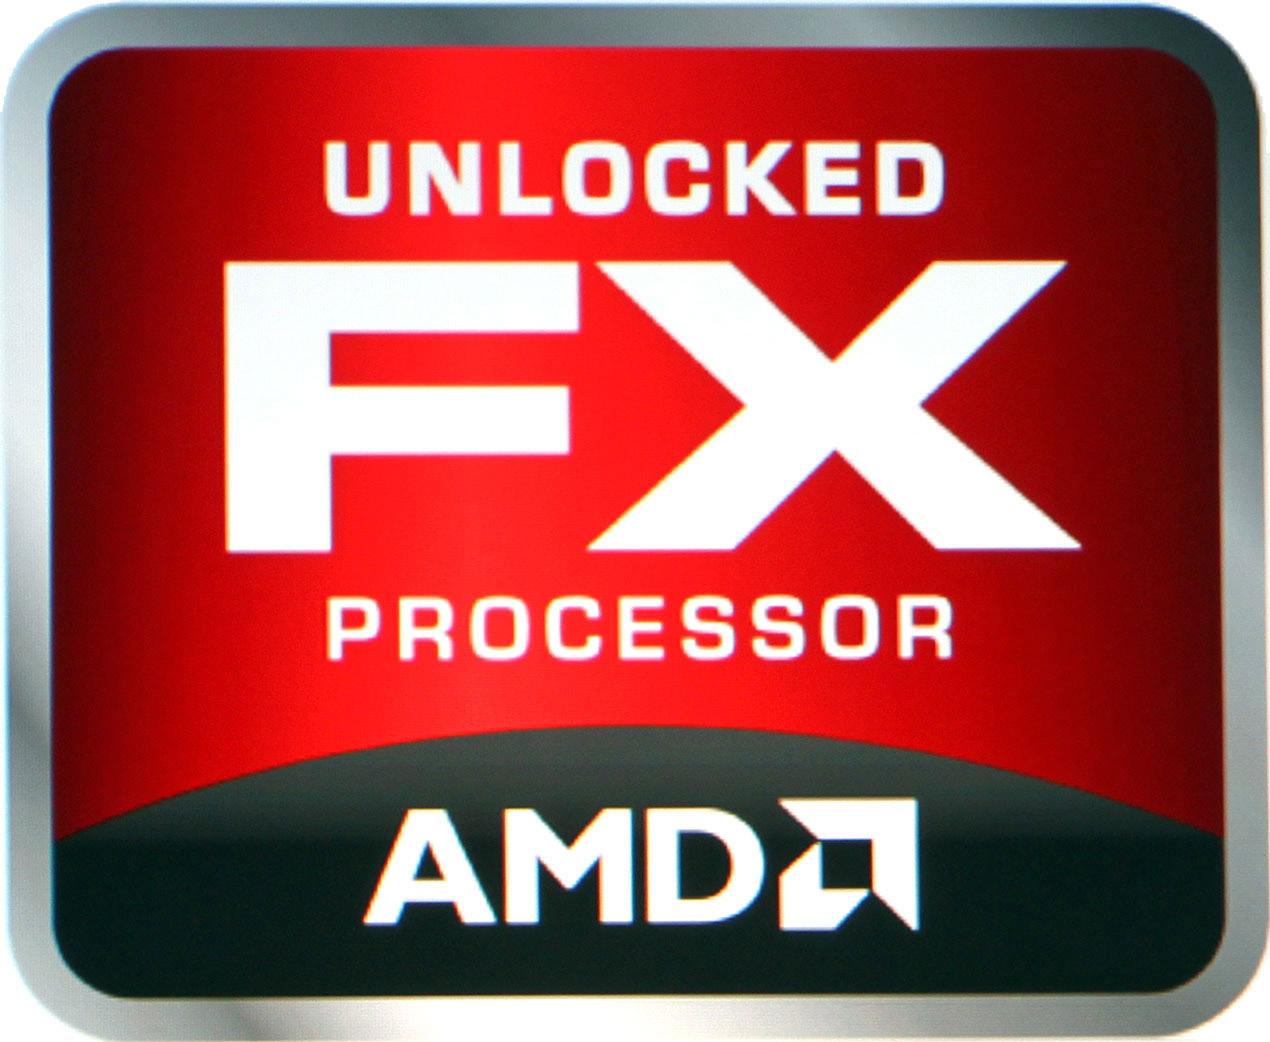 AMD FX processor logo